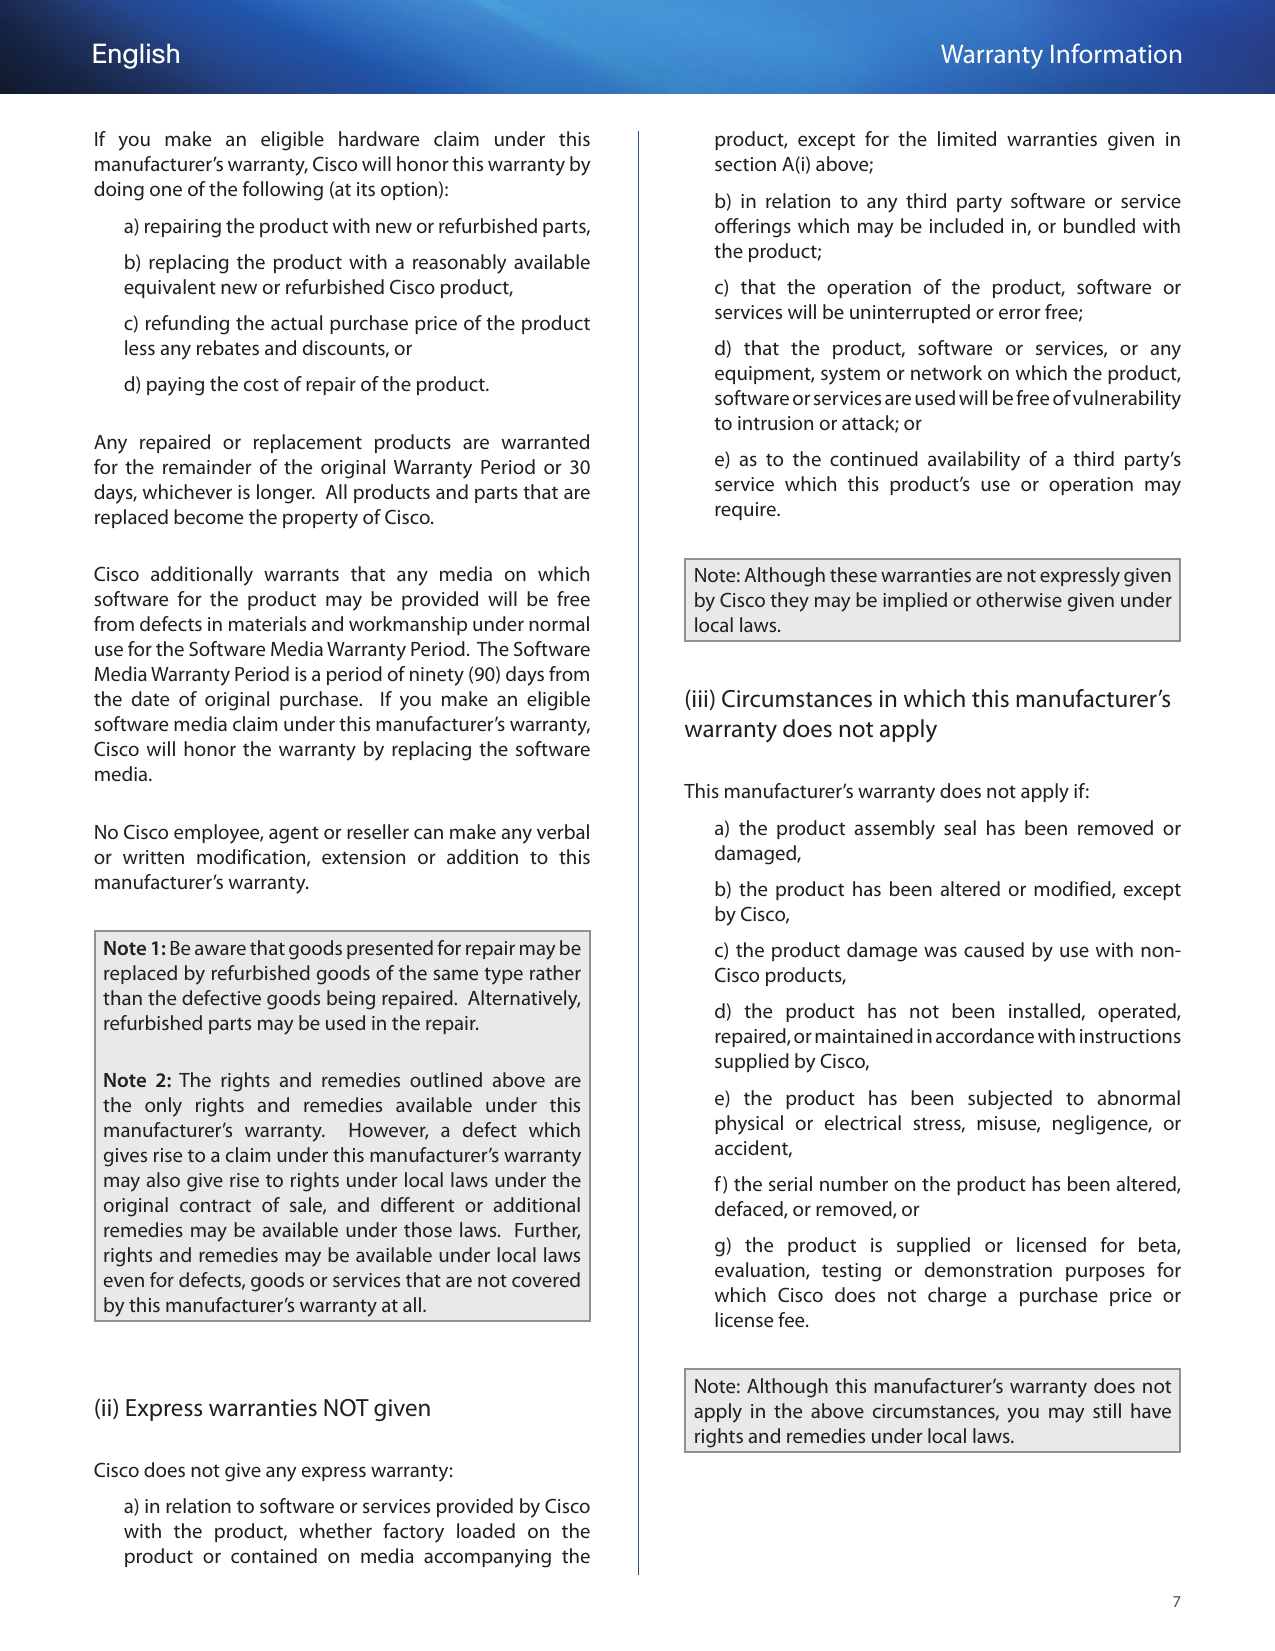 Linksys Se3005 Owner S Manual Warranty Information